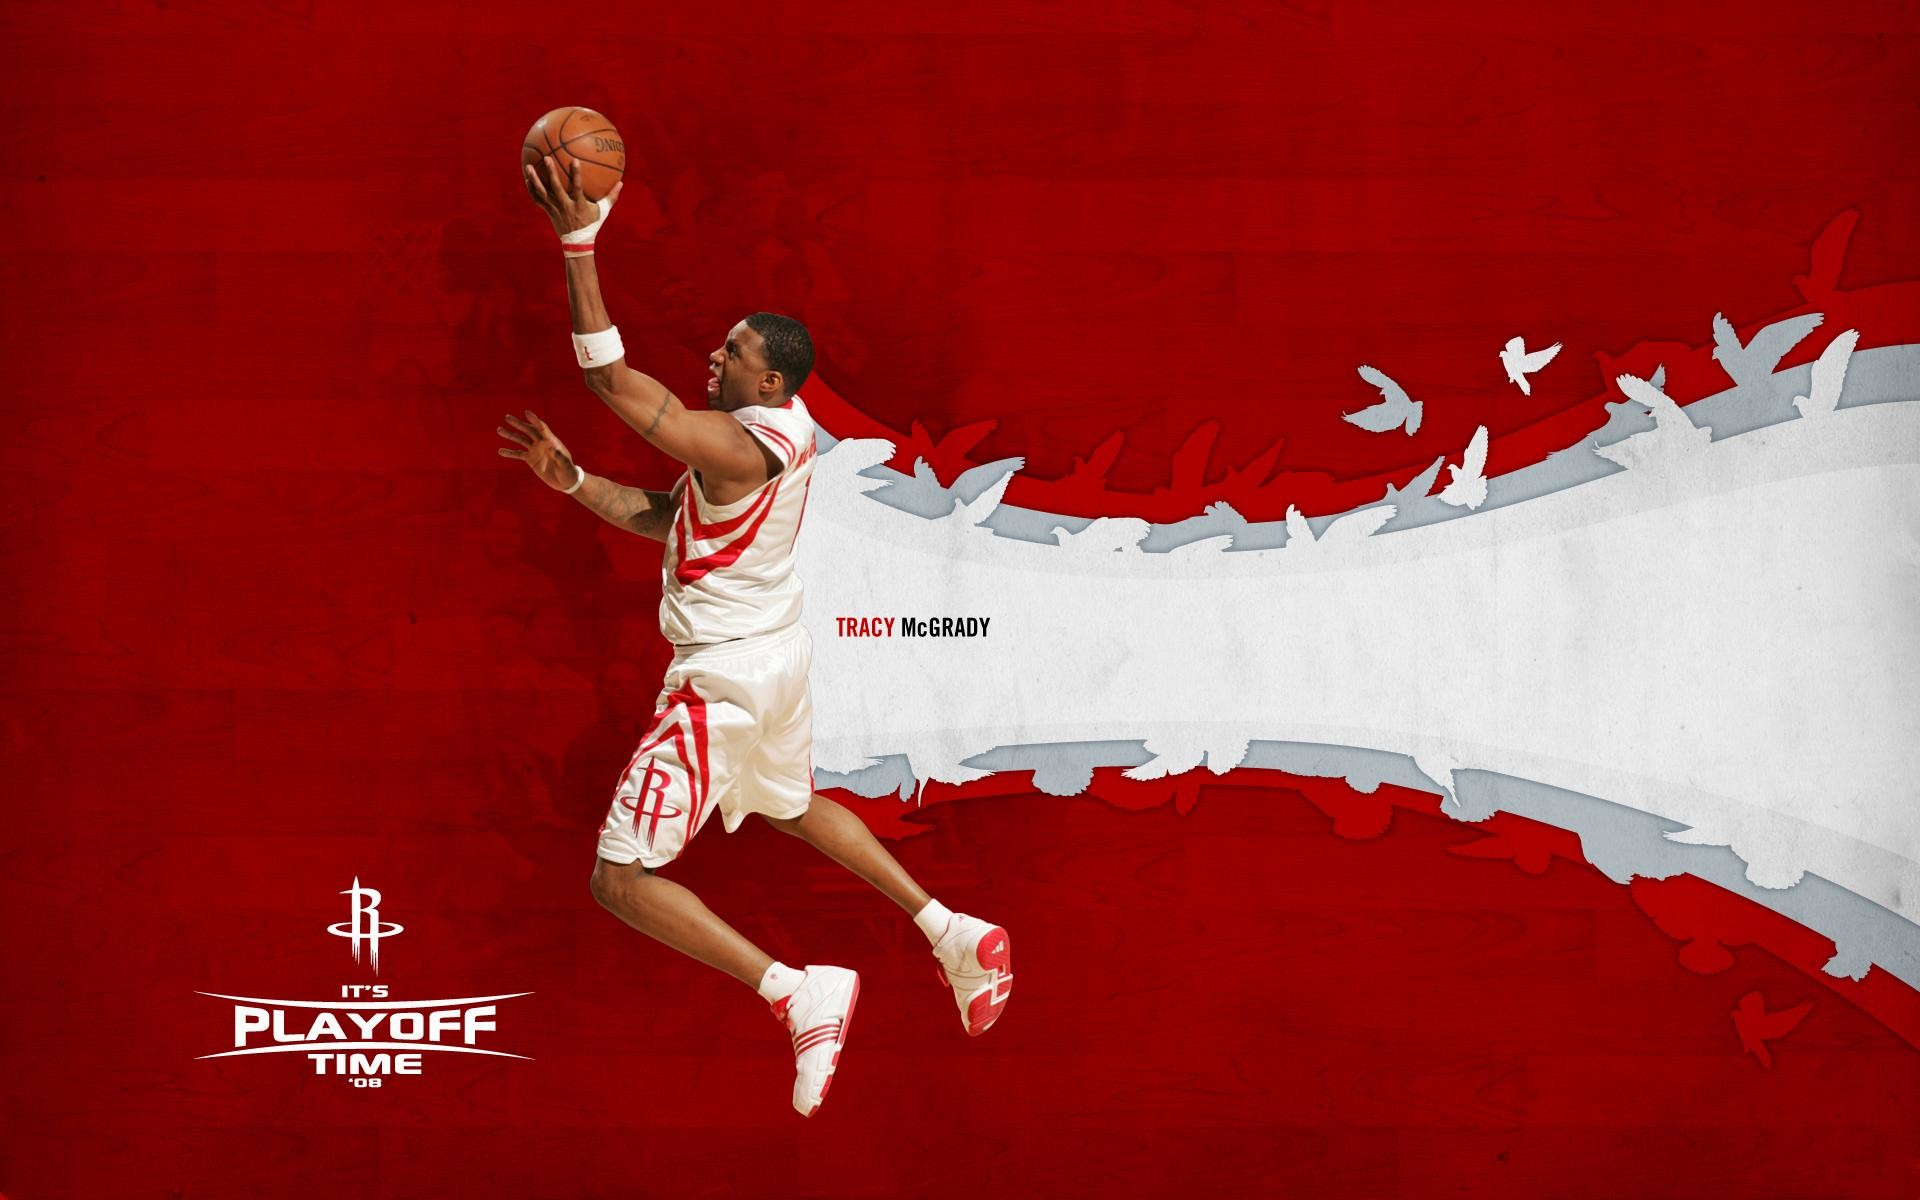 Tracy-Mcgrady-Houston-Rockets-Wallpaper